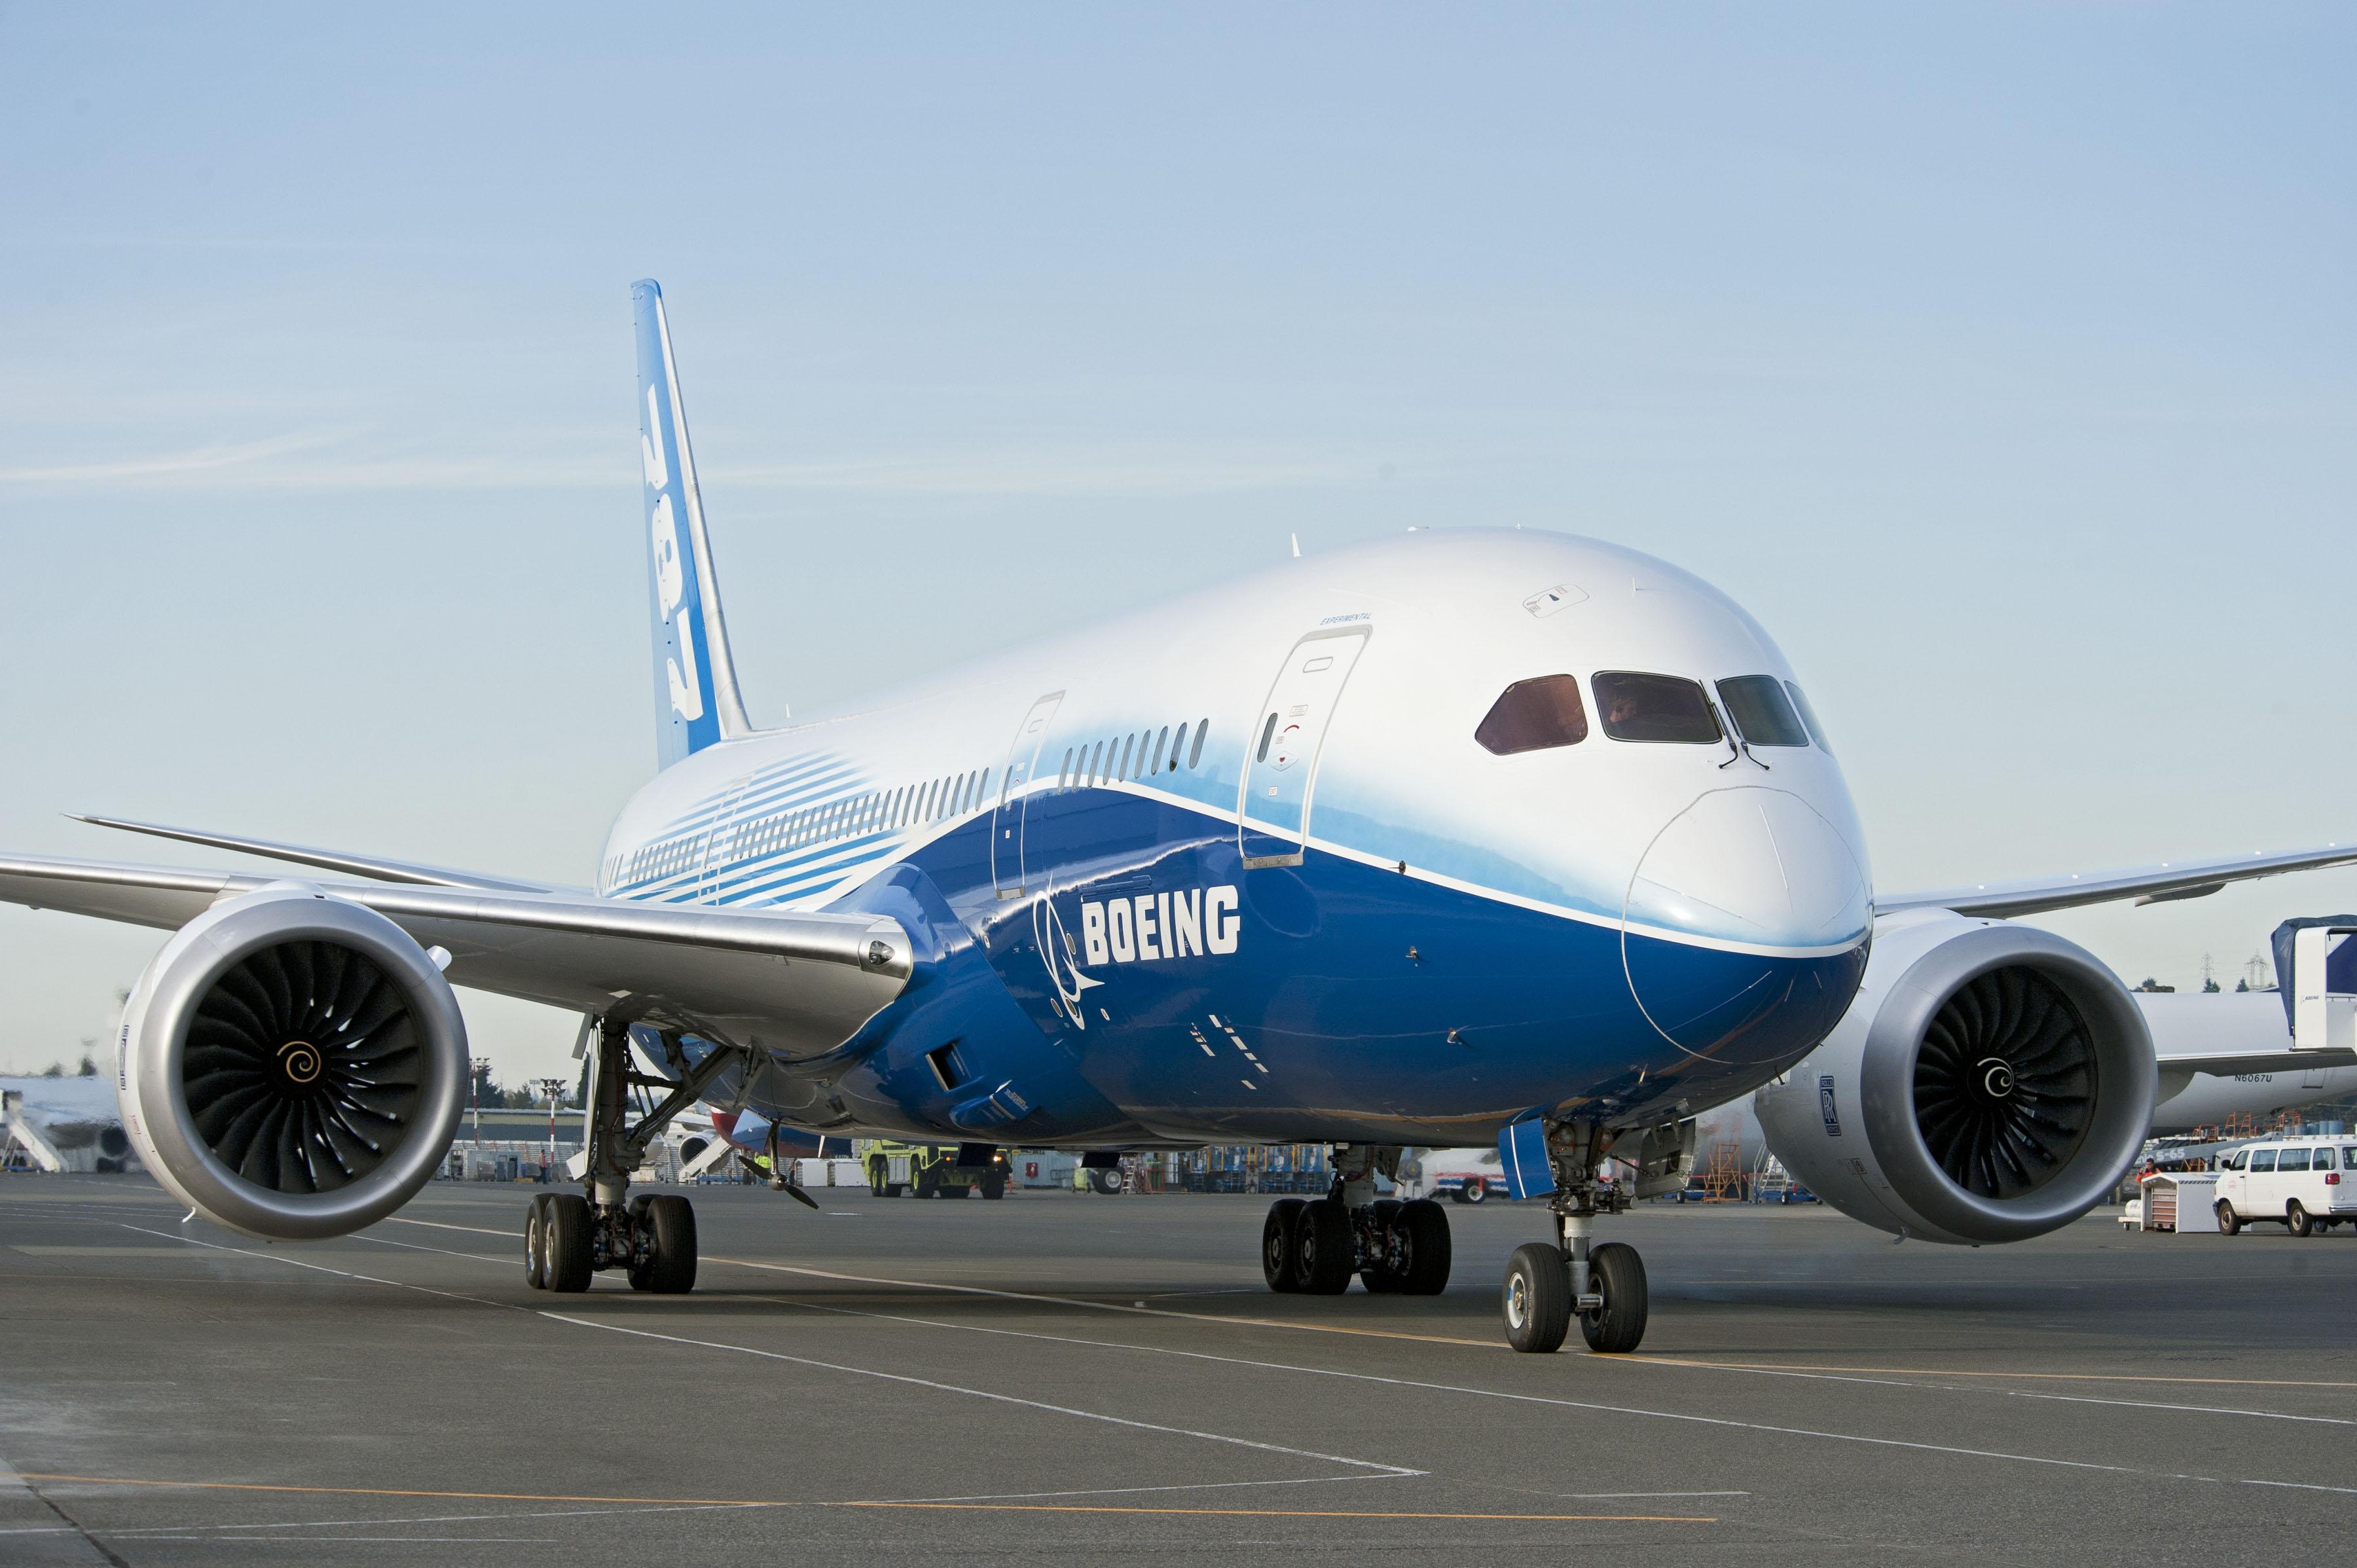 Boeing 787 Dreamliner. Источник: cdn.airnation.net.